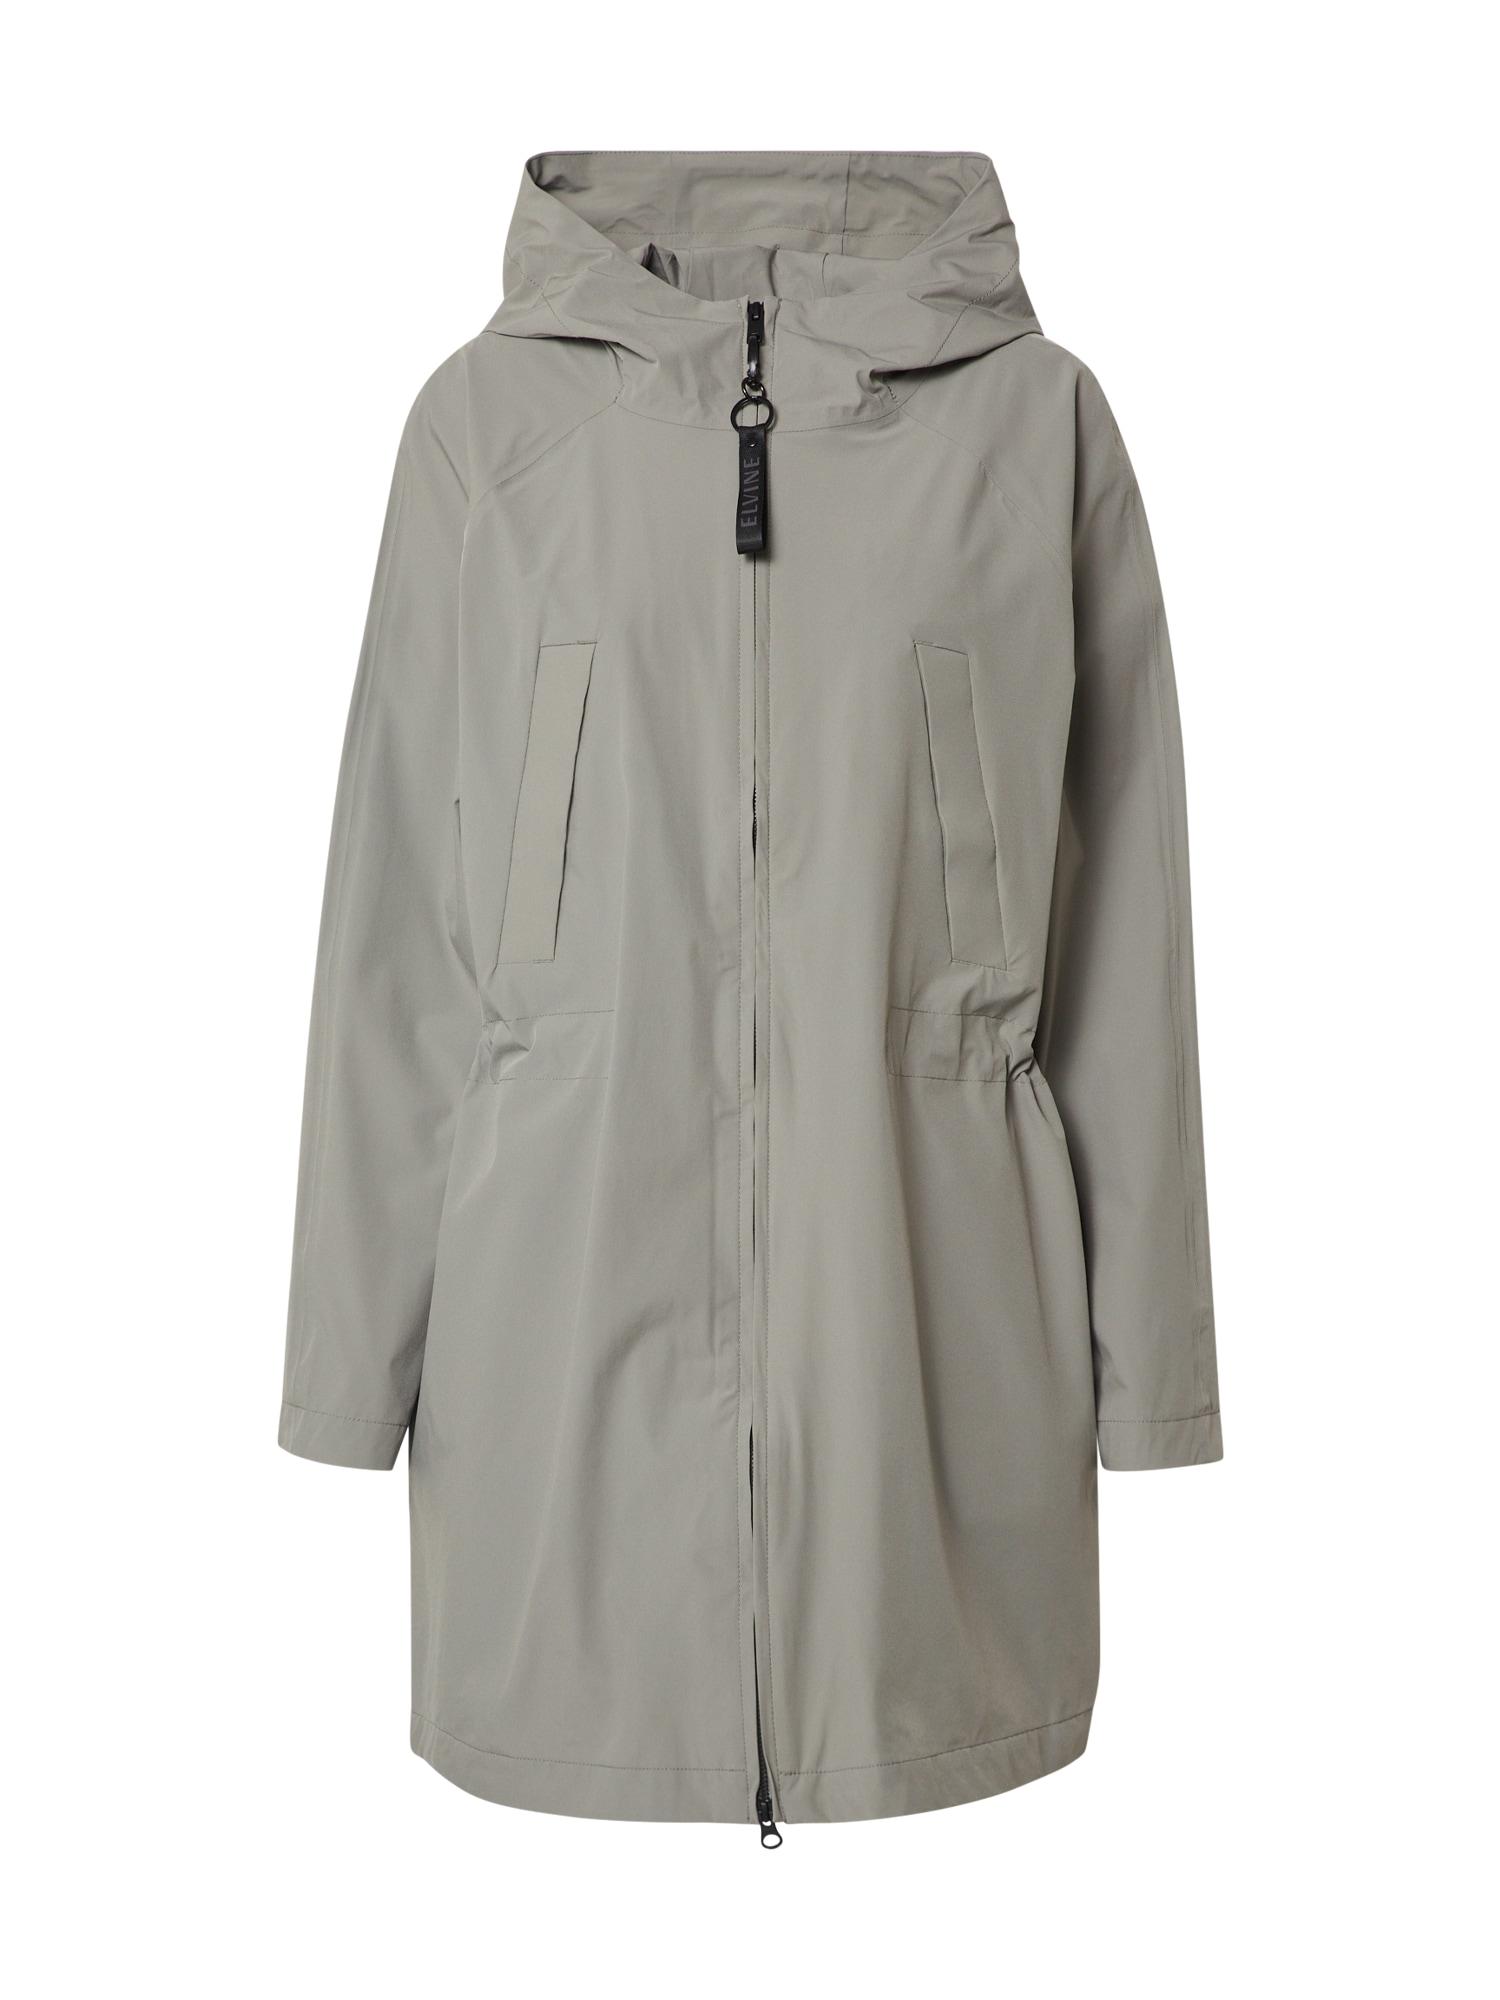 elvine Rudeninis-žieminis paltas 'Othilia' pilka